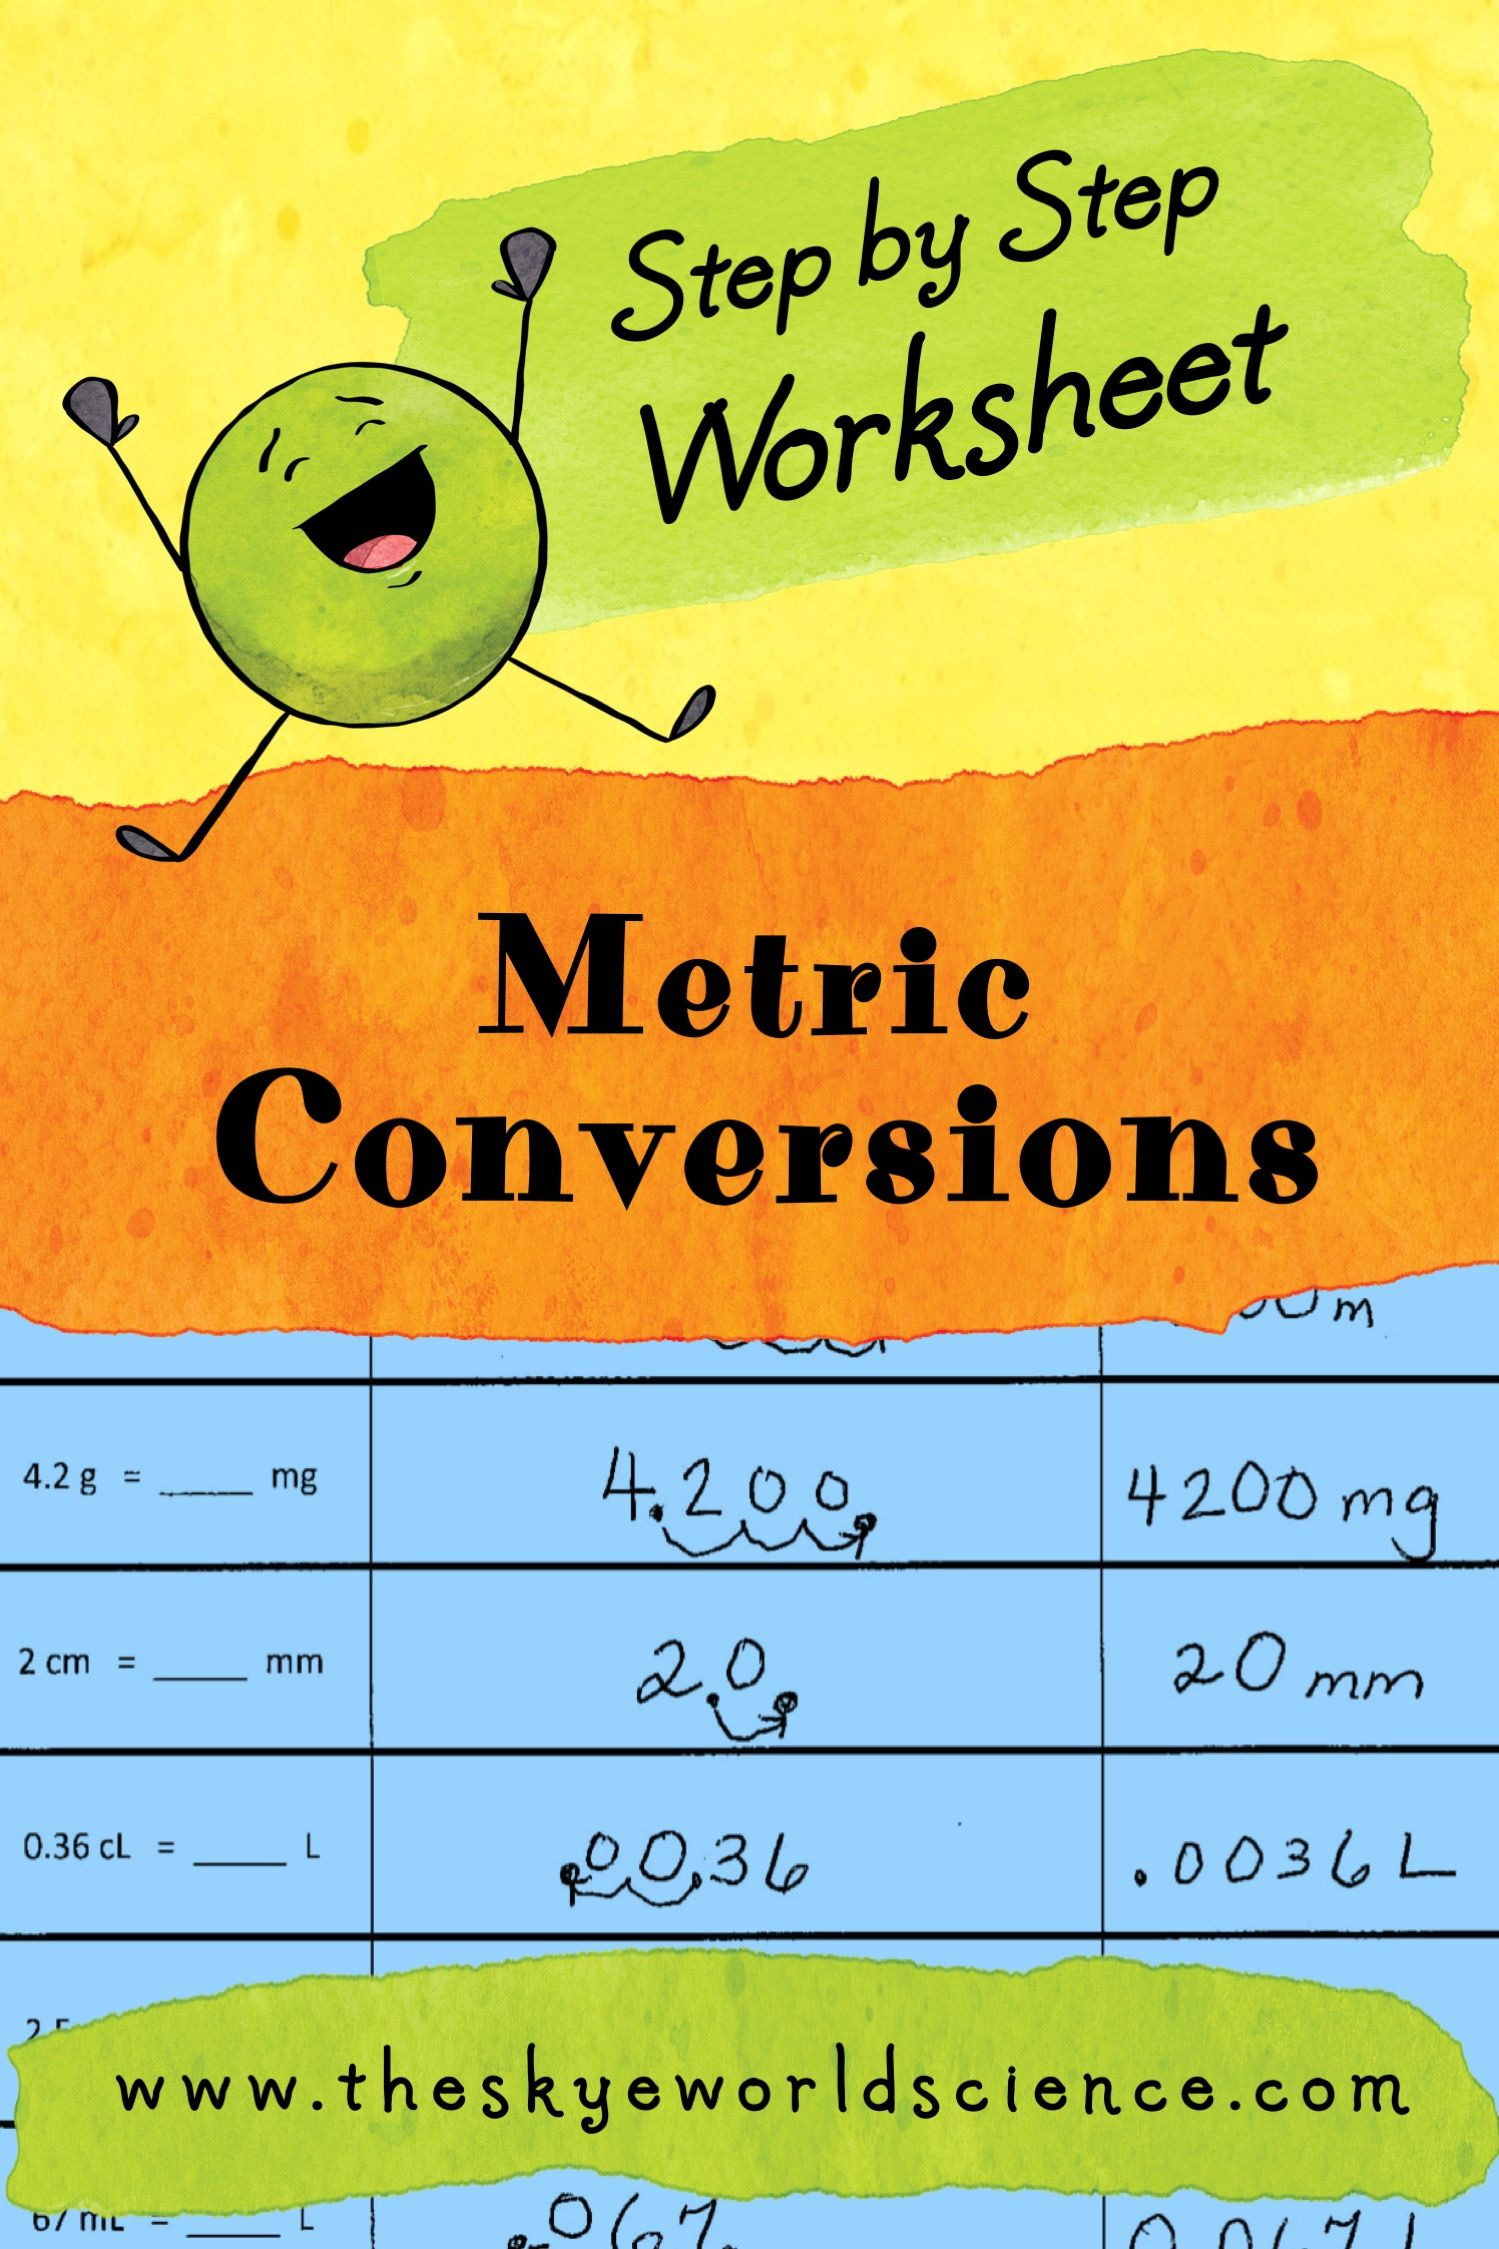 Metric Conversions Worksheet Activity   Metric conversions [ 2249 x 1499 Pixel ]